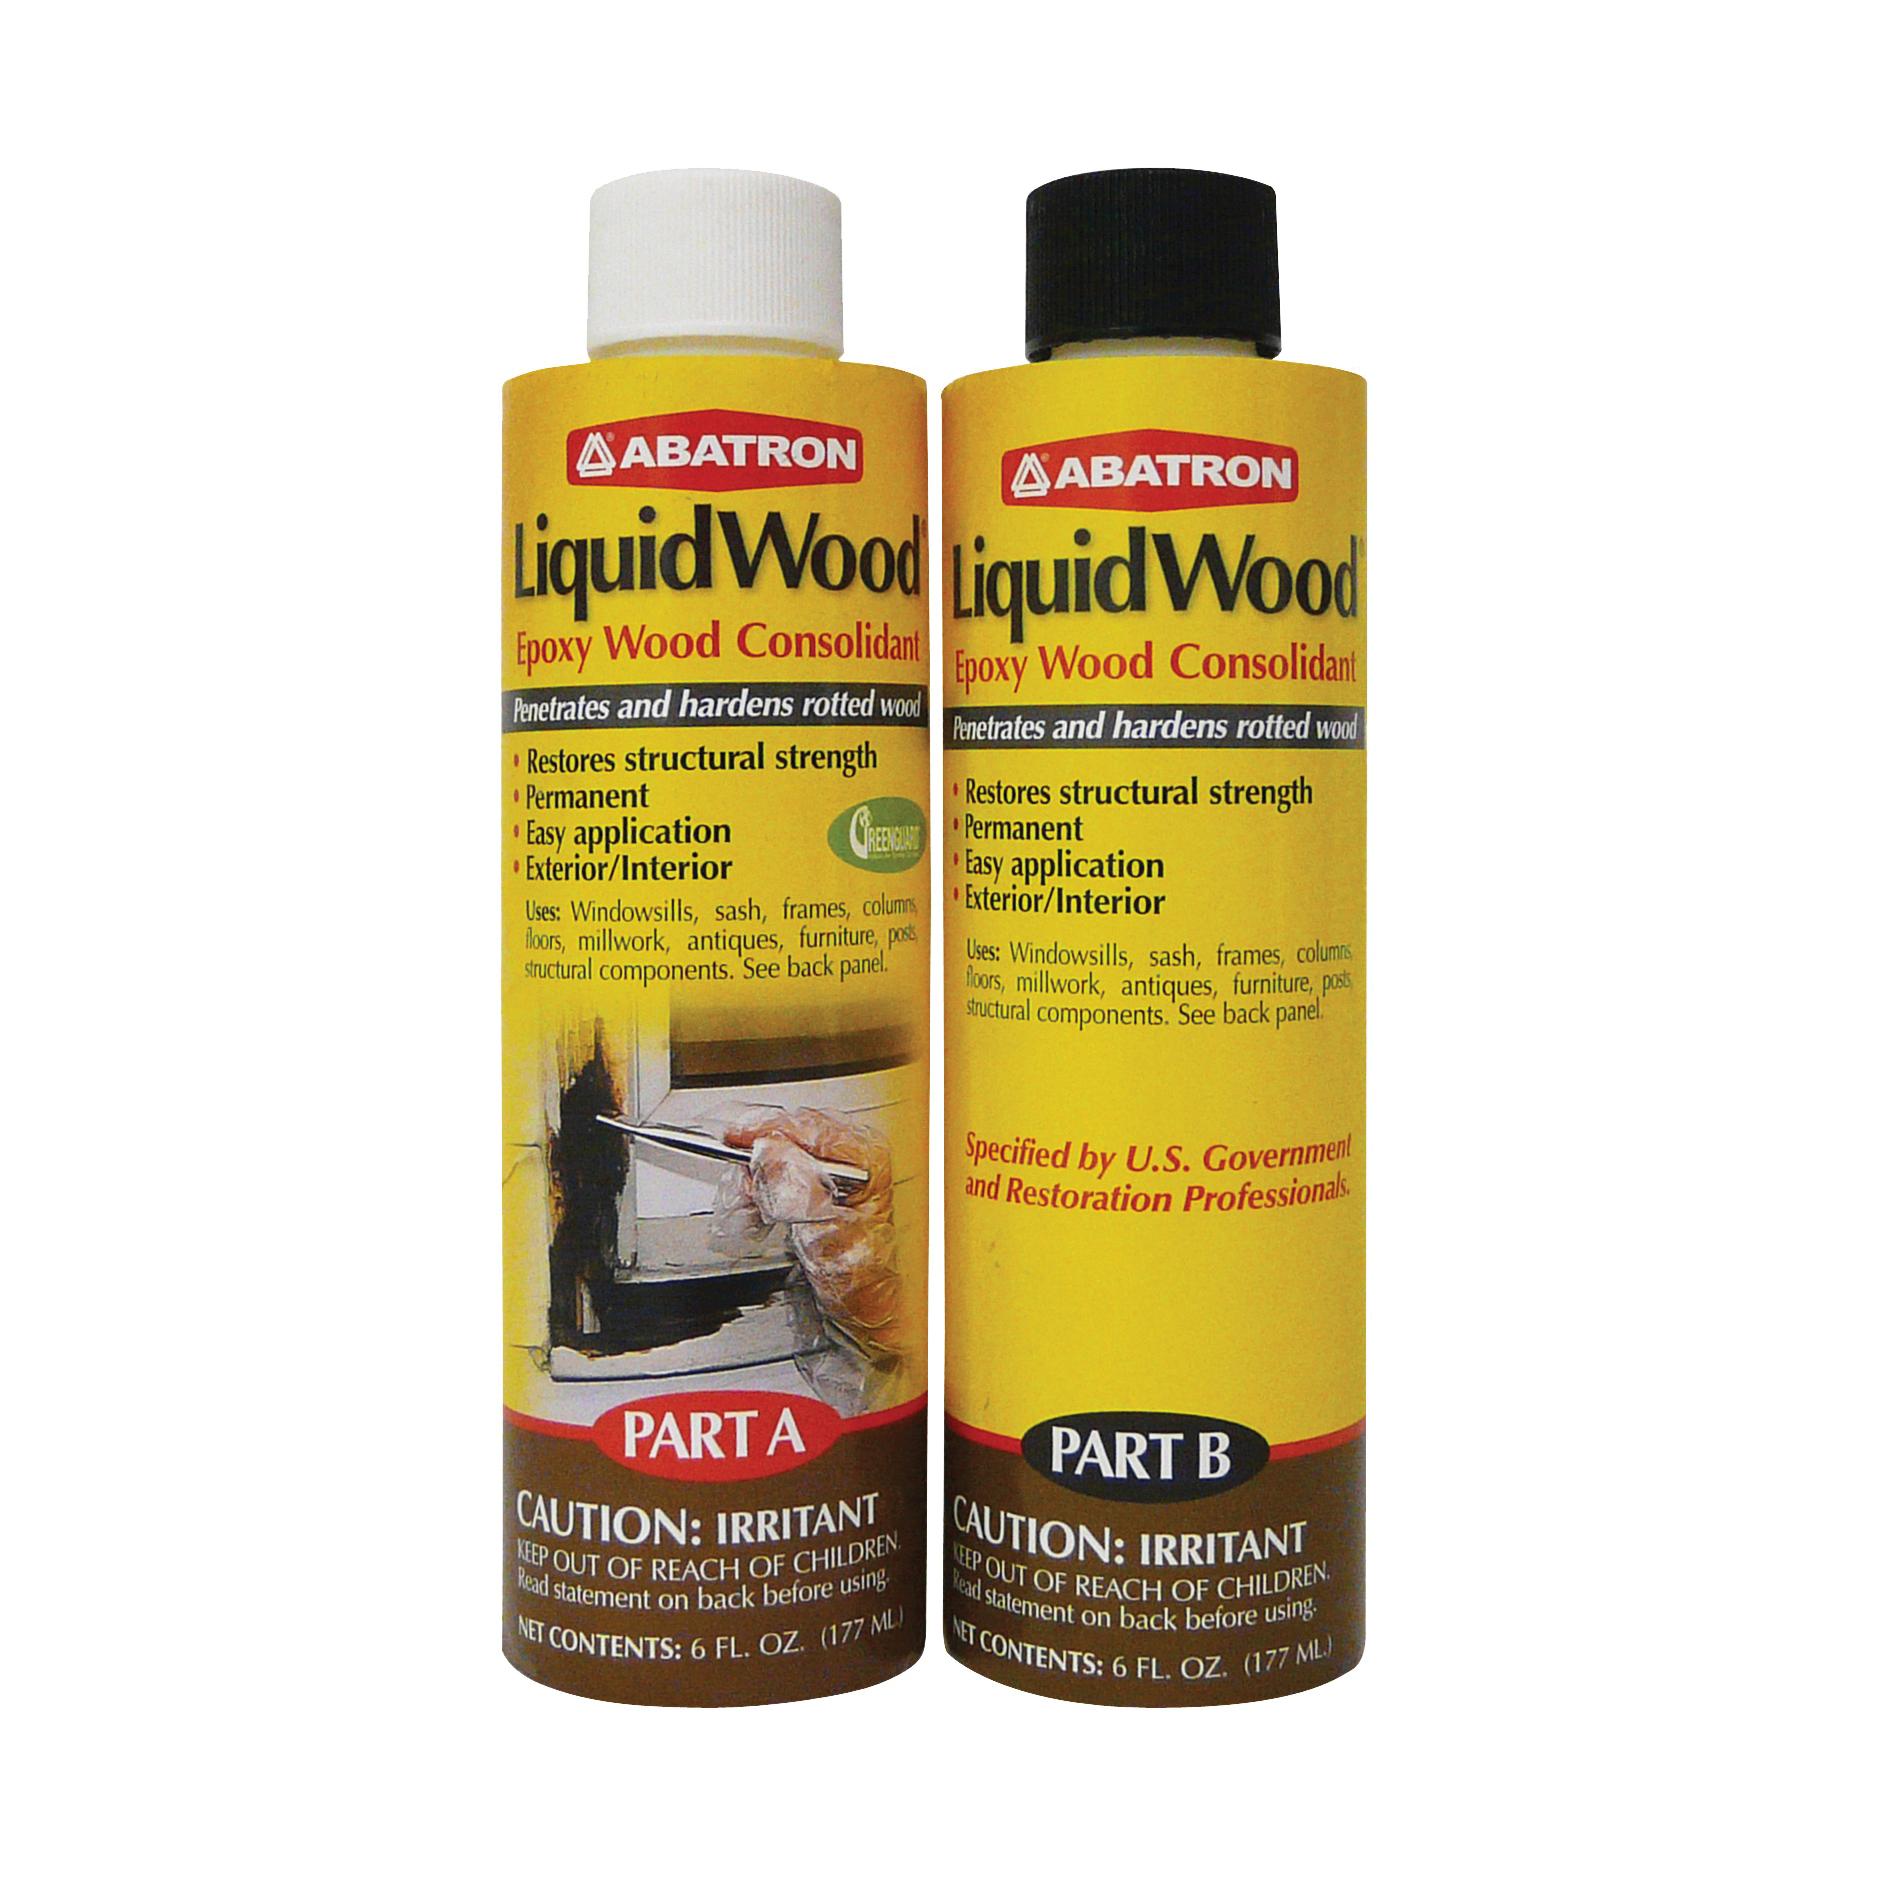 Picture of ABATRON LiquidWood LWAB6OR Wood Filler, Liquid, Faint, Slightly Aromatic Part A, Irritating Ammonia Part B, Clear